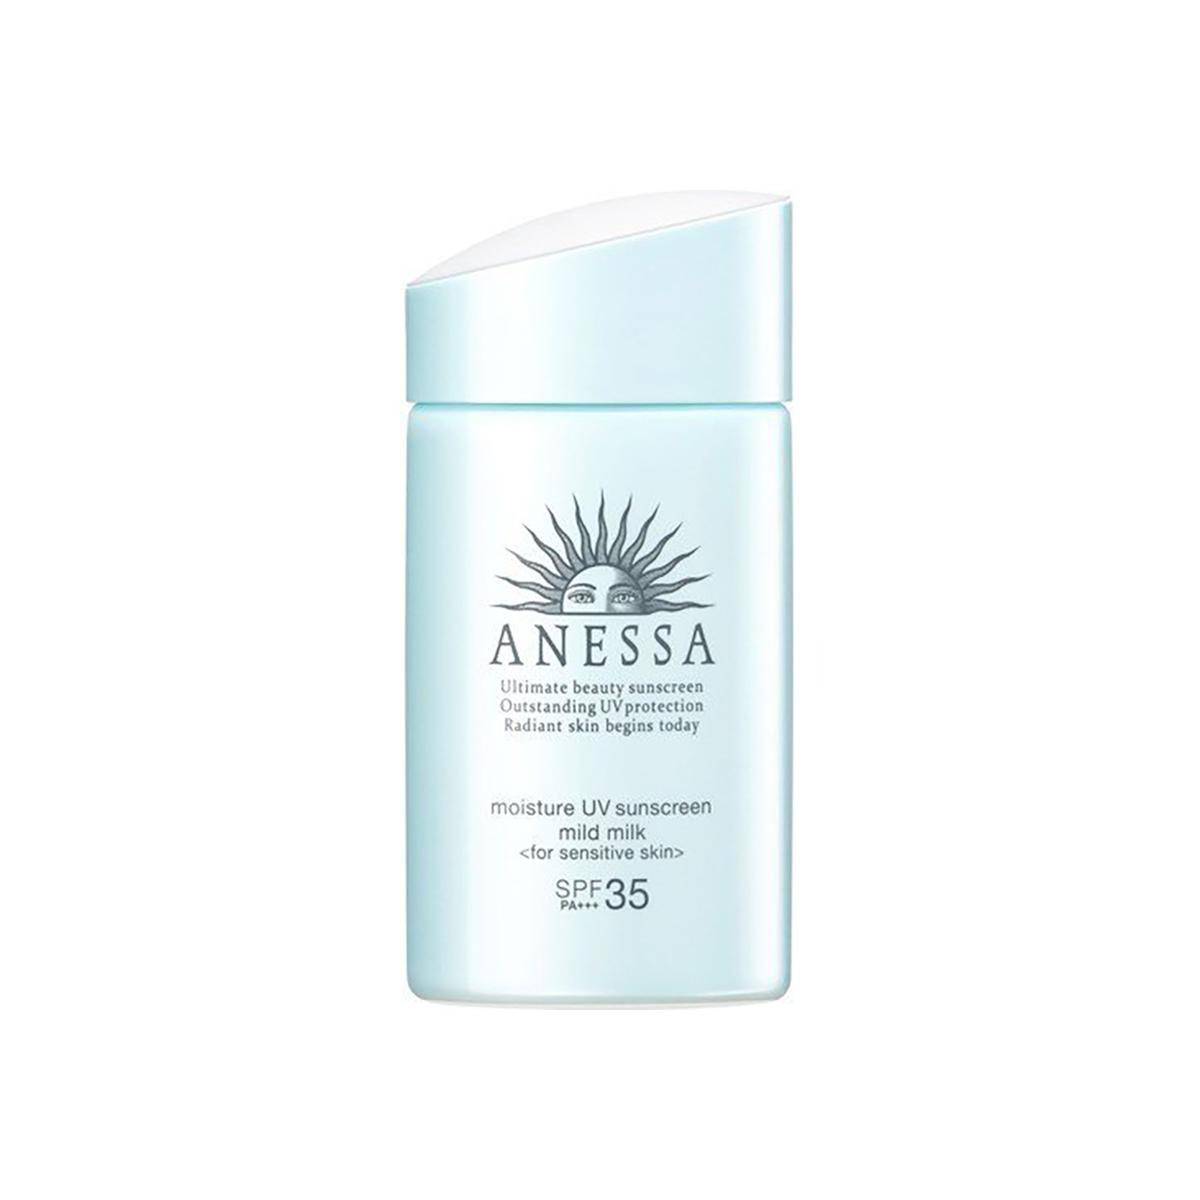 Buy Shiseido ANESSA  Moisture UV Mild Milk For Sensitive Skin SPF 35 Pa+++ Sunscreen 60ml  [Ship from SG / 100% Authentic] Singapore